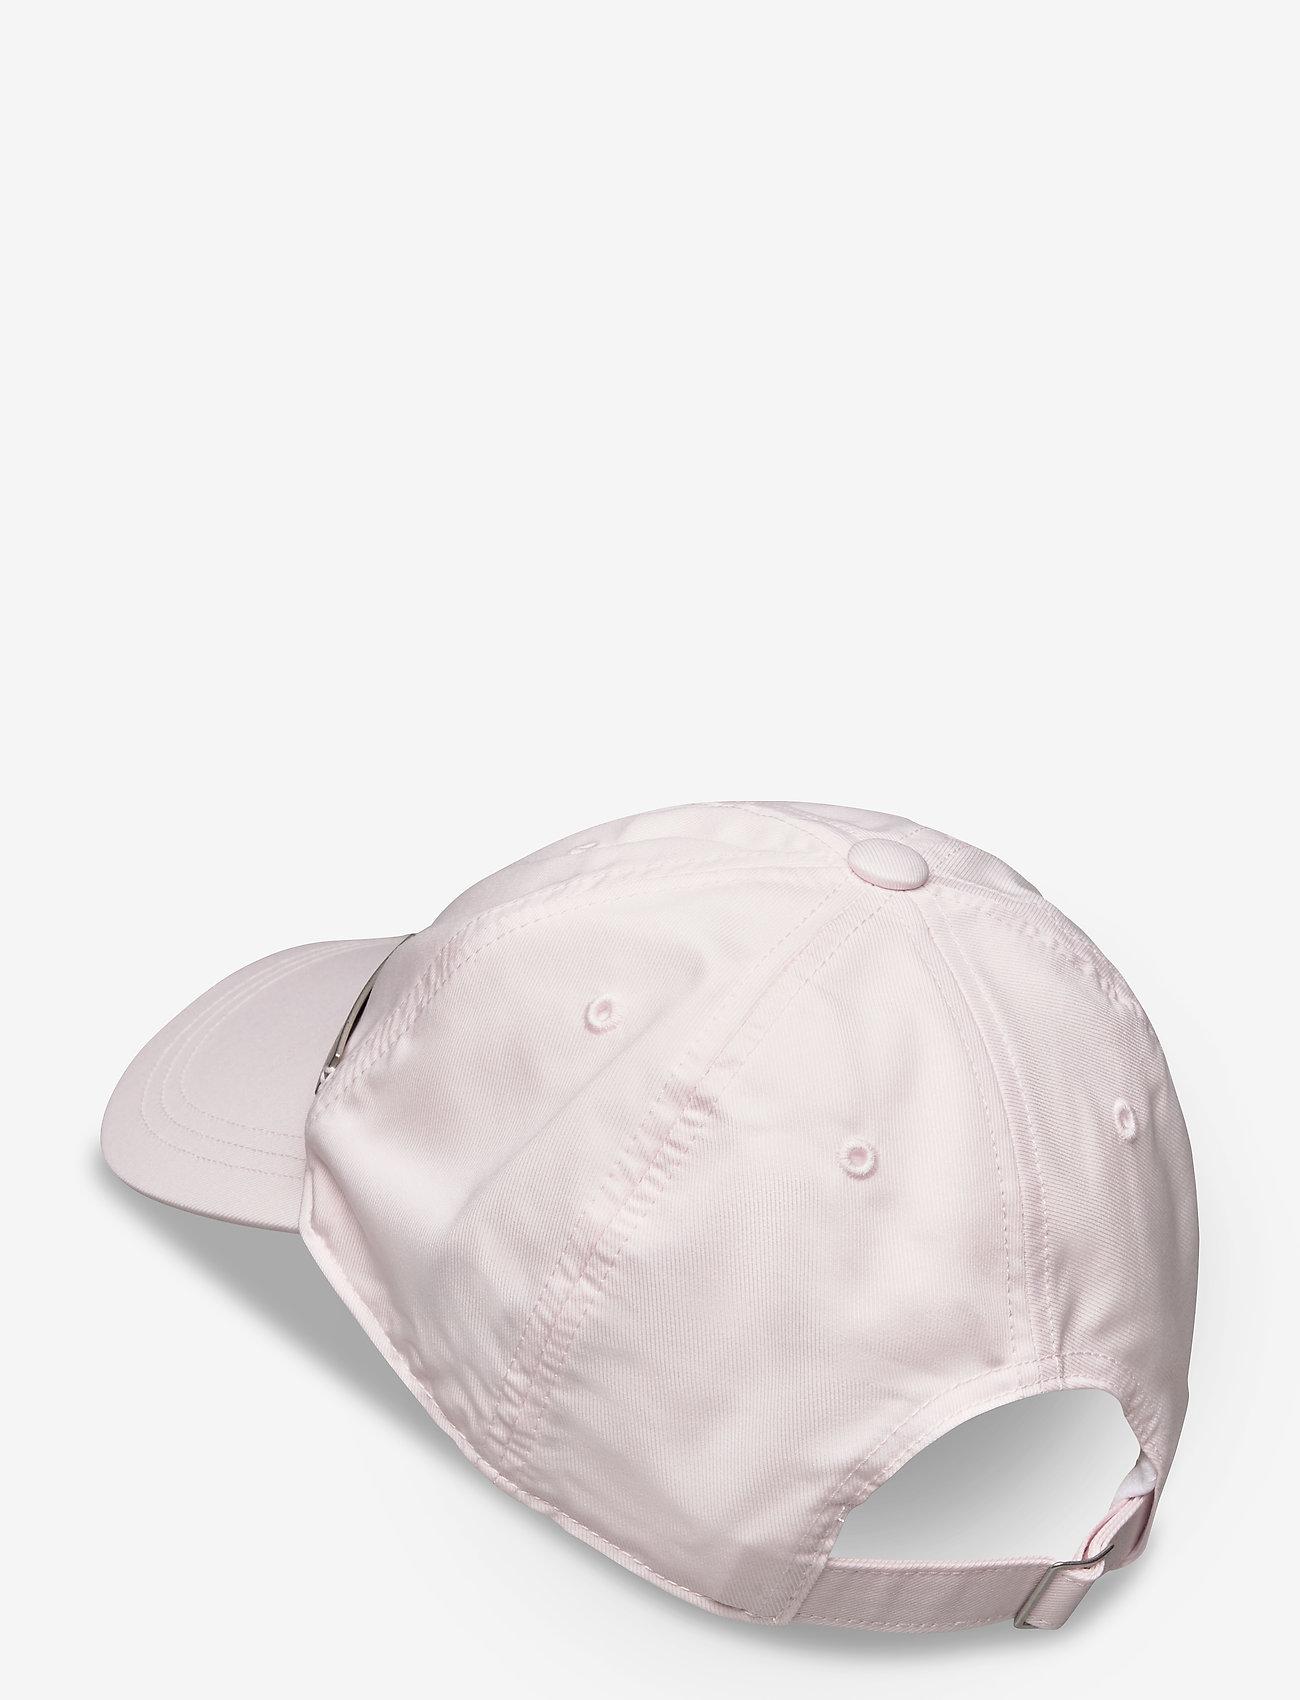 Reebok Performance - W FOUND CAP - kasketter - glapnk - 1